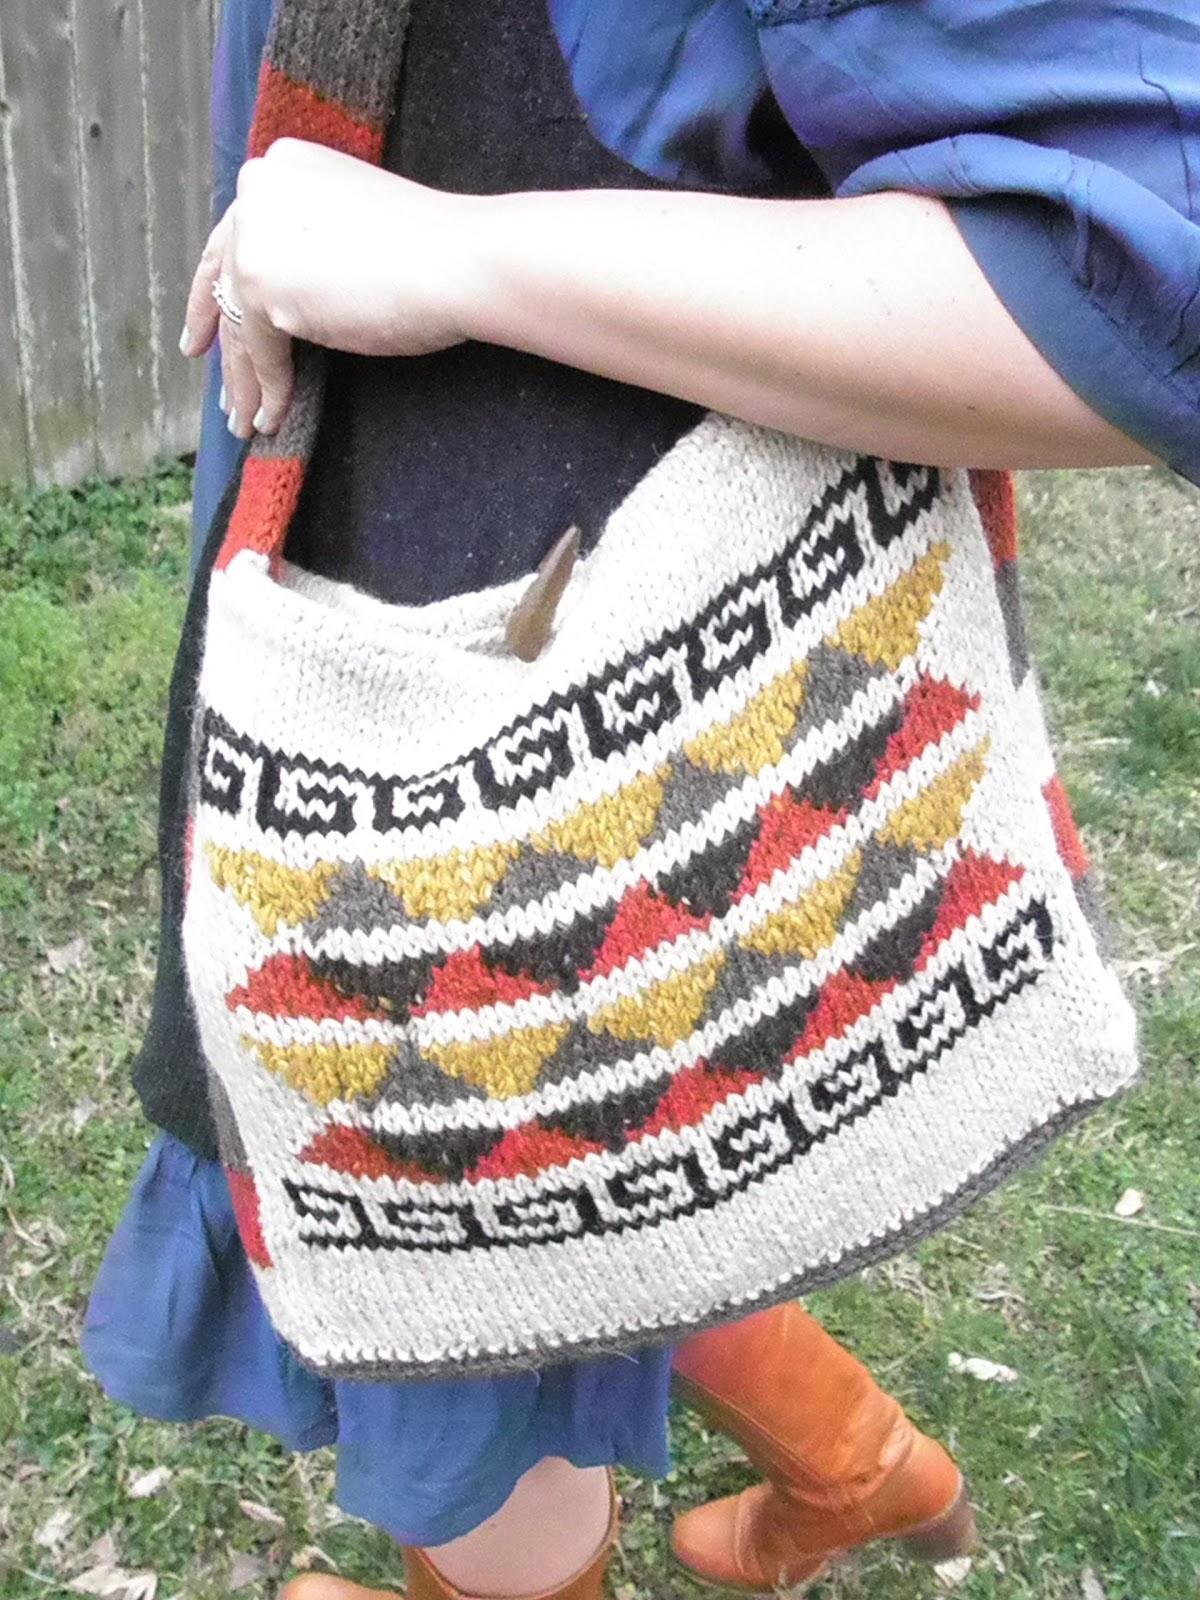 Bohemian Knitting Patterns : * elletrain knits *: Bohemian Satchel Knitting Pattern